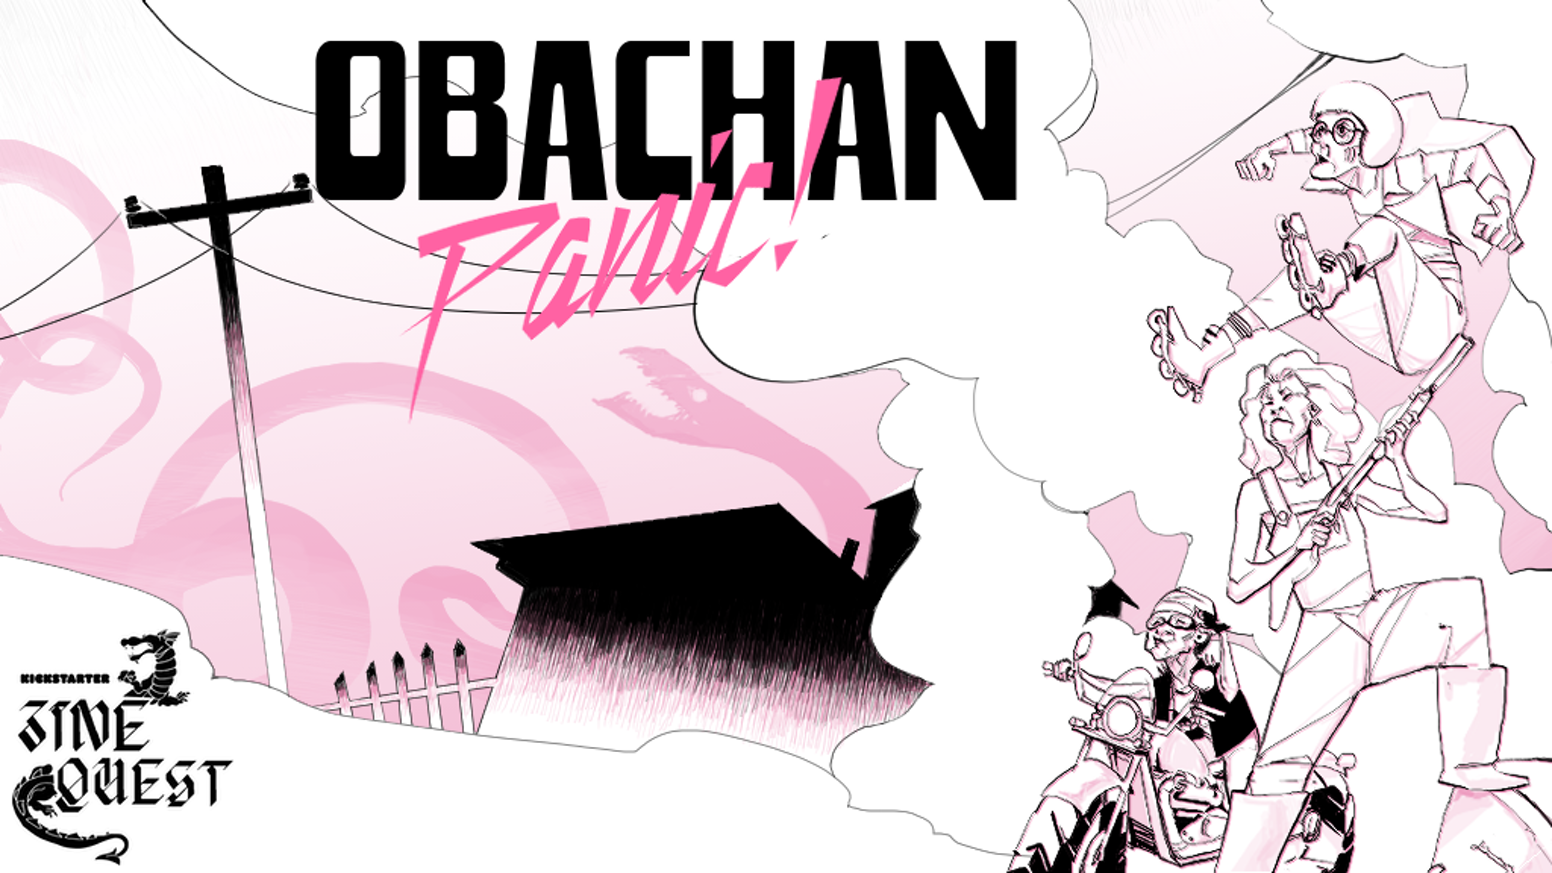 Obachan Panic Rpg Zine By Flyaturtle Kickstarter